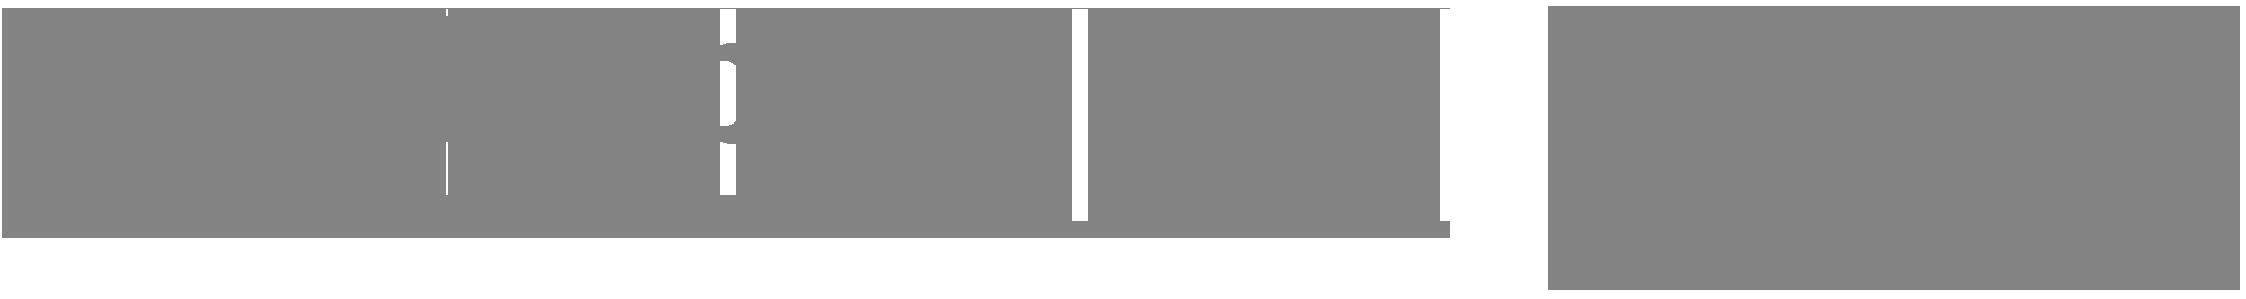 TU-HU-RBS